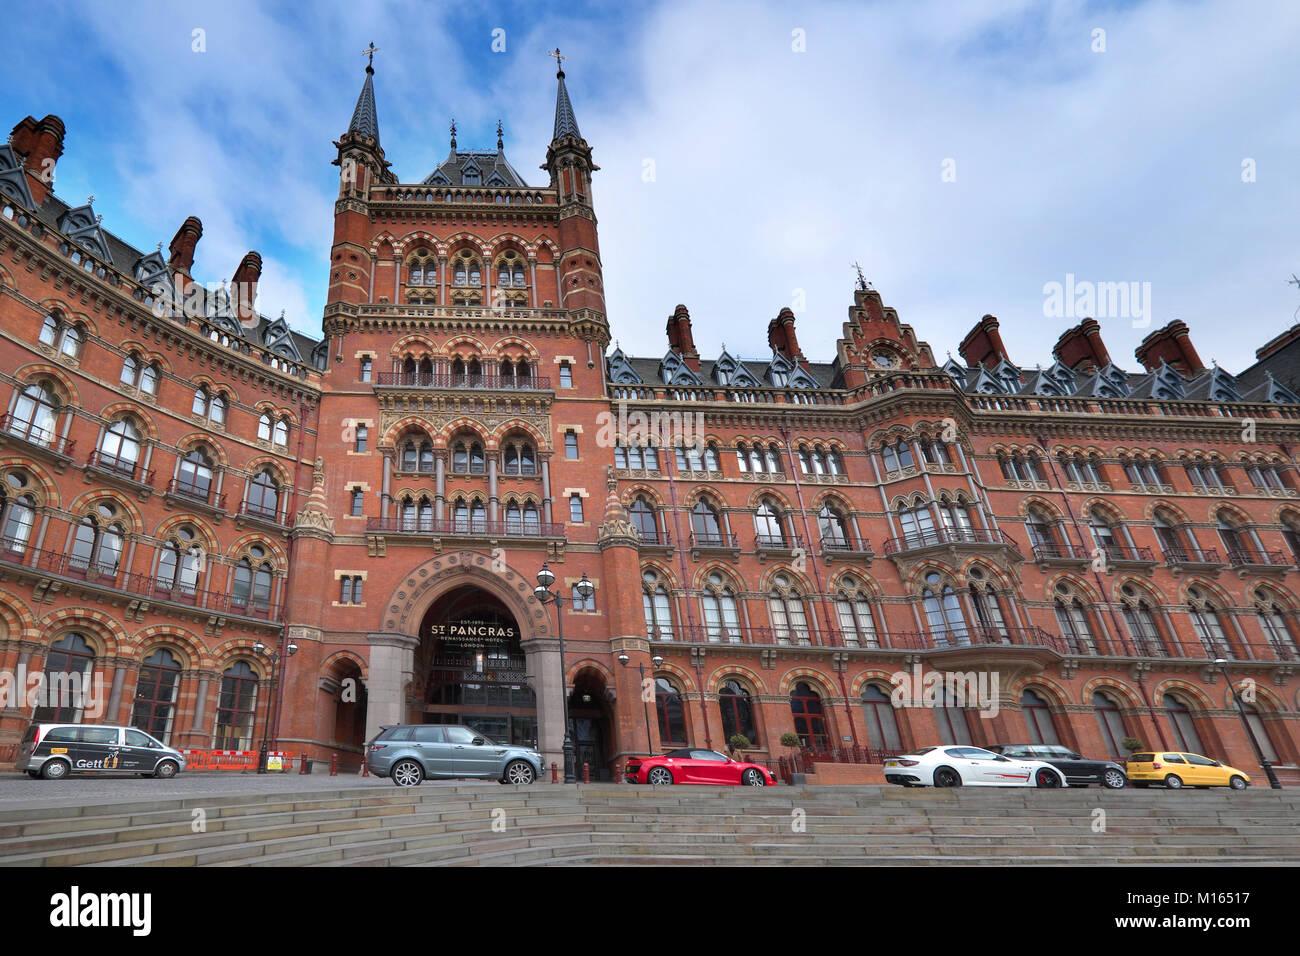 the st pancras hotel london - Stock Image